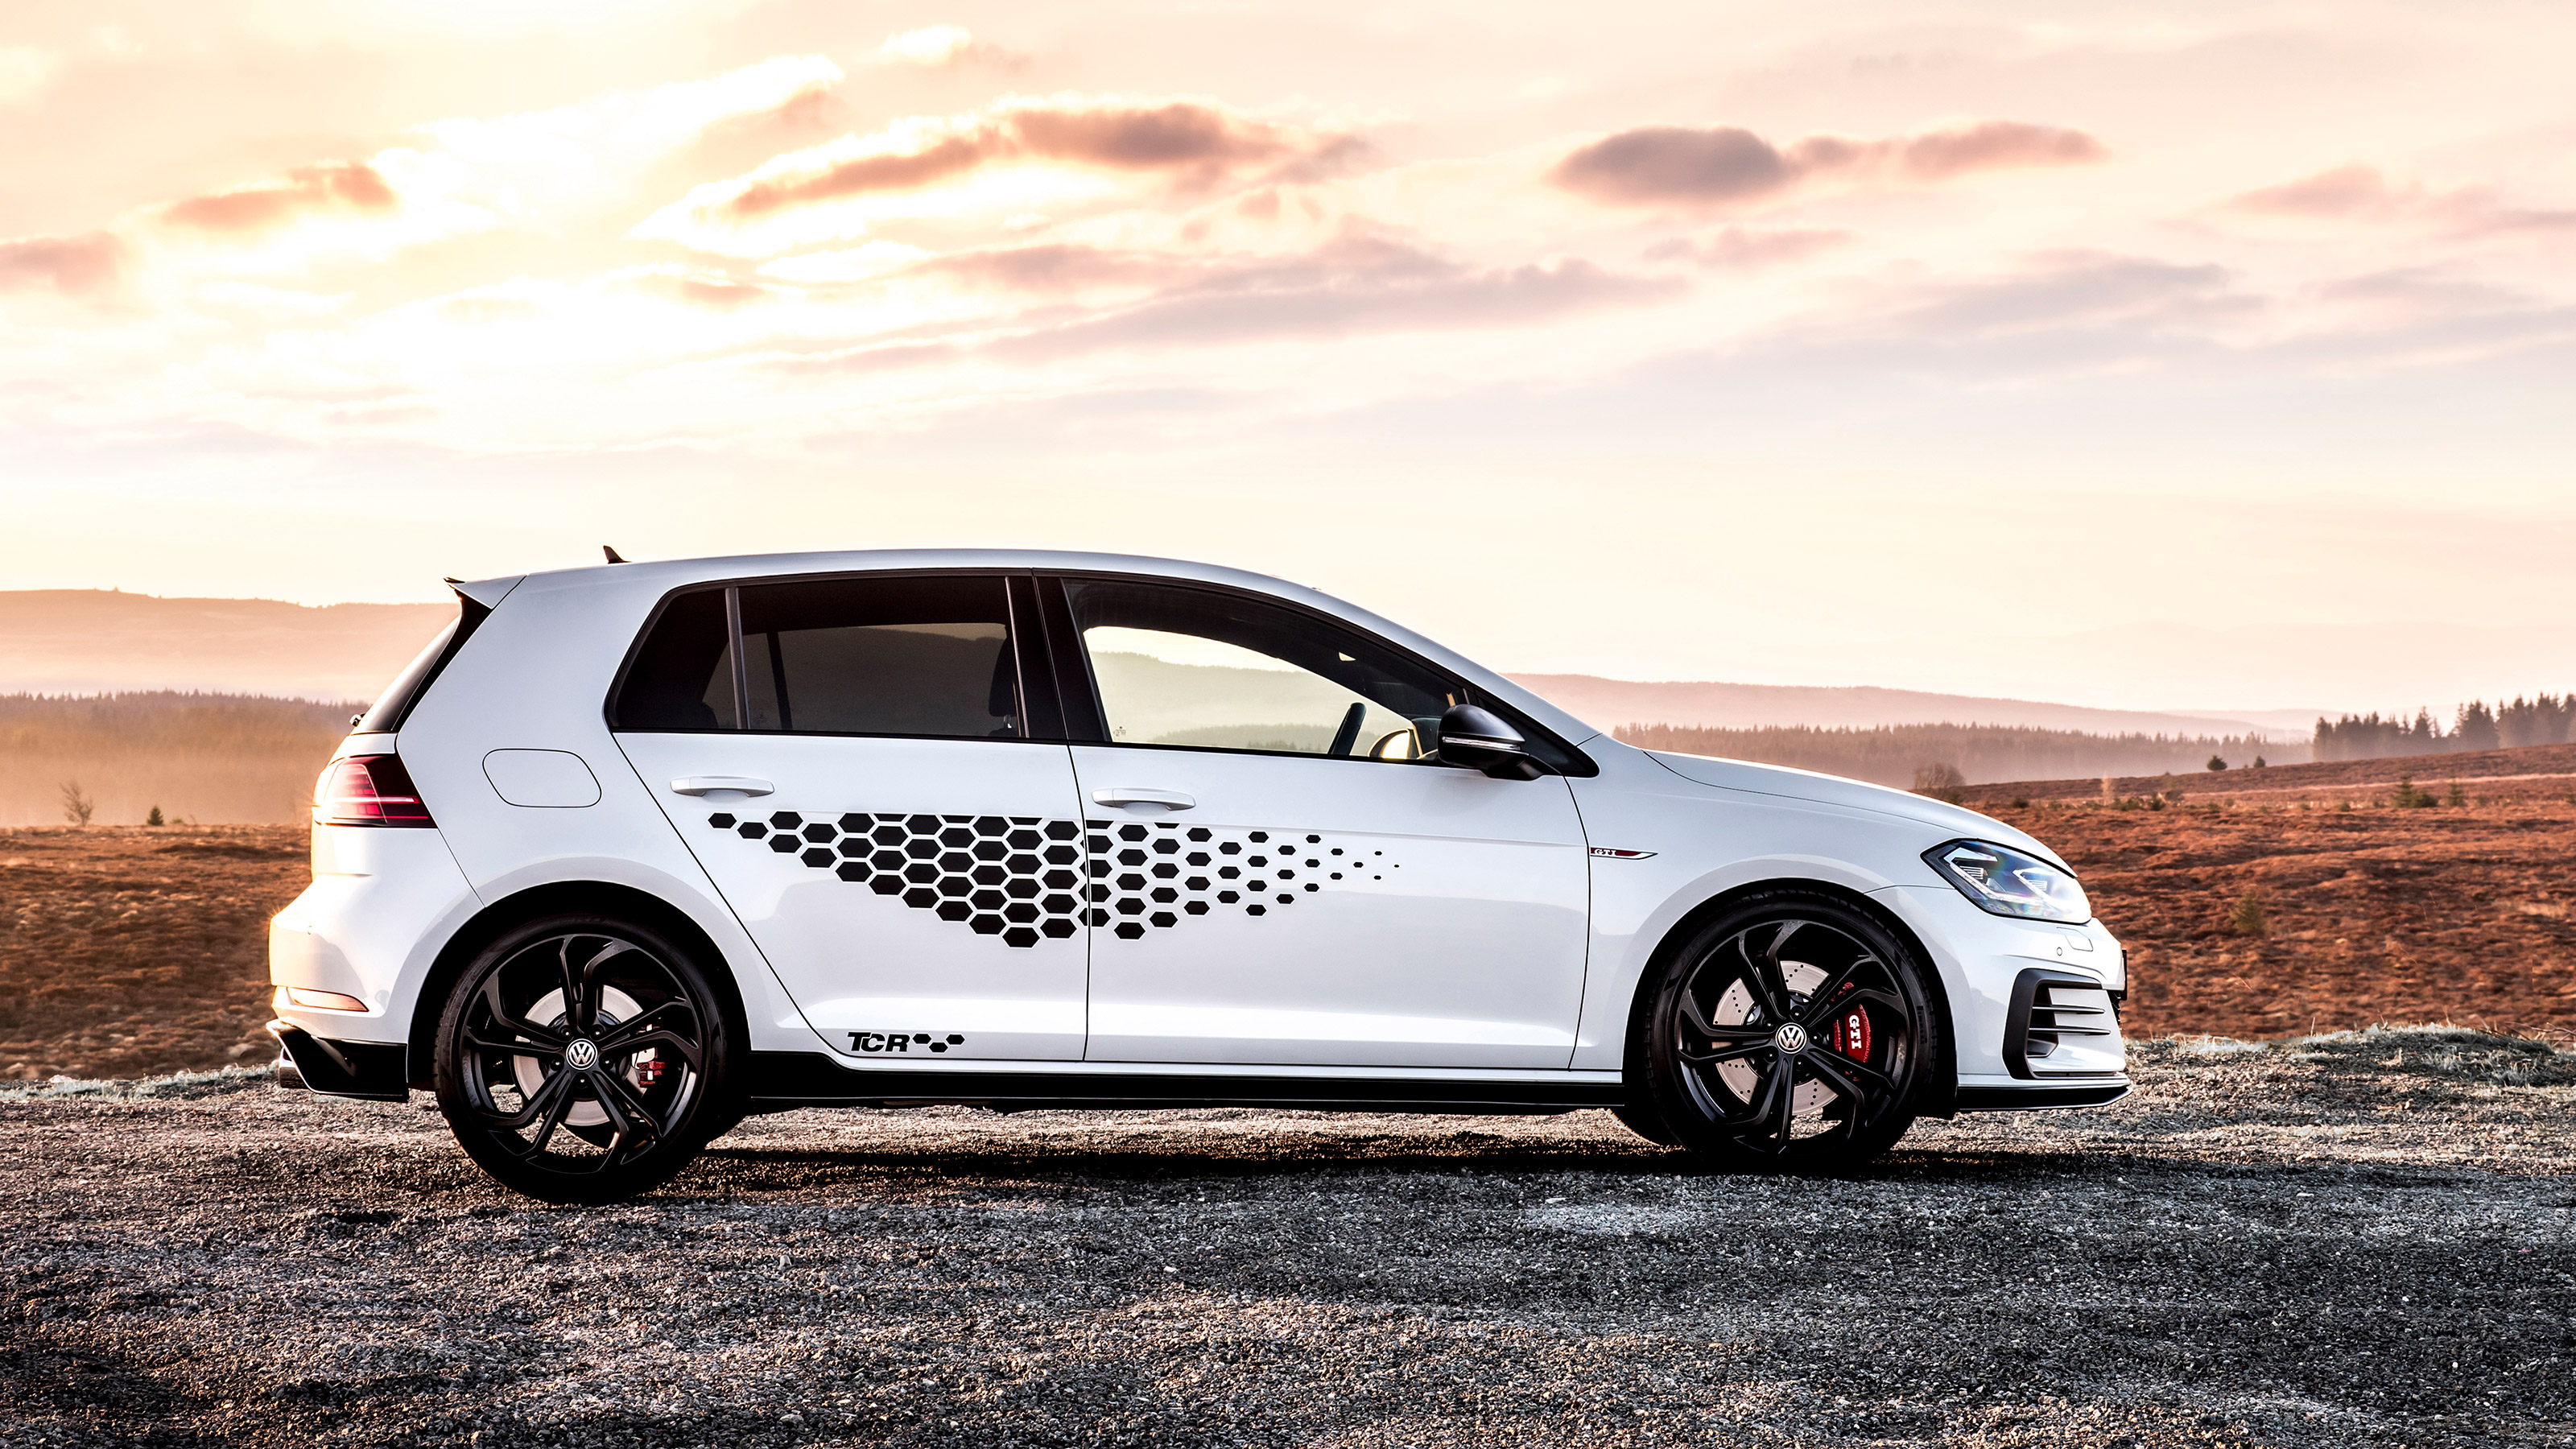 Volkswagen Golf Gti Tcr Price And Specs Evo